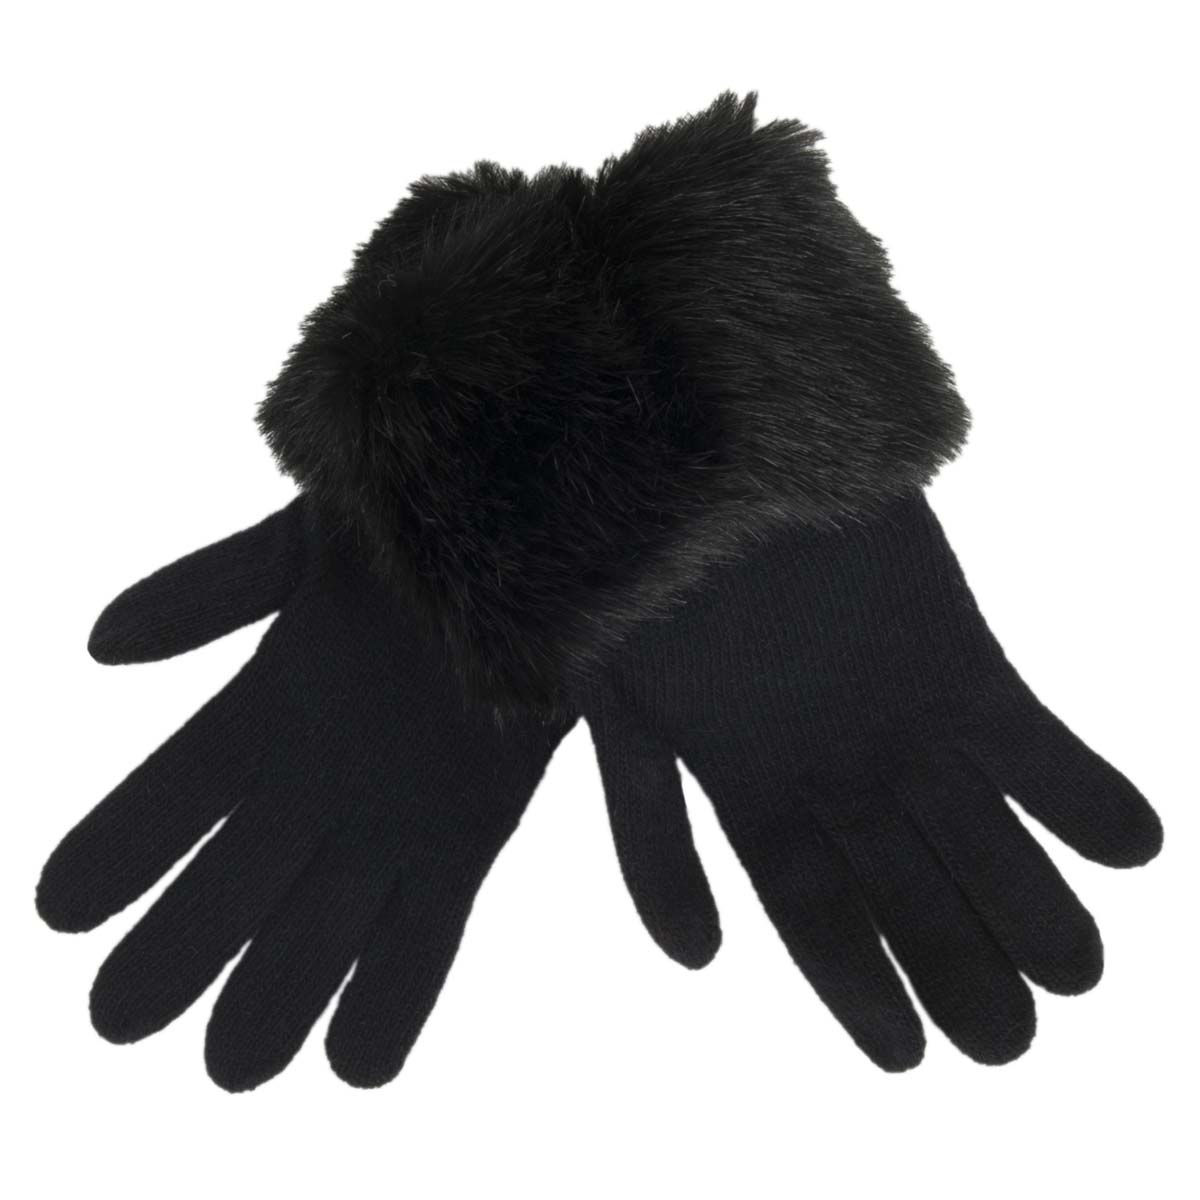 guanti con pelliccia ecologica firmati ALESSANDRA BACCI d8c4734adc1c